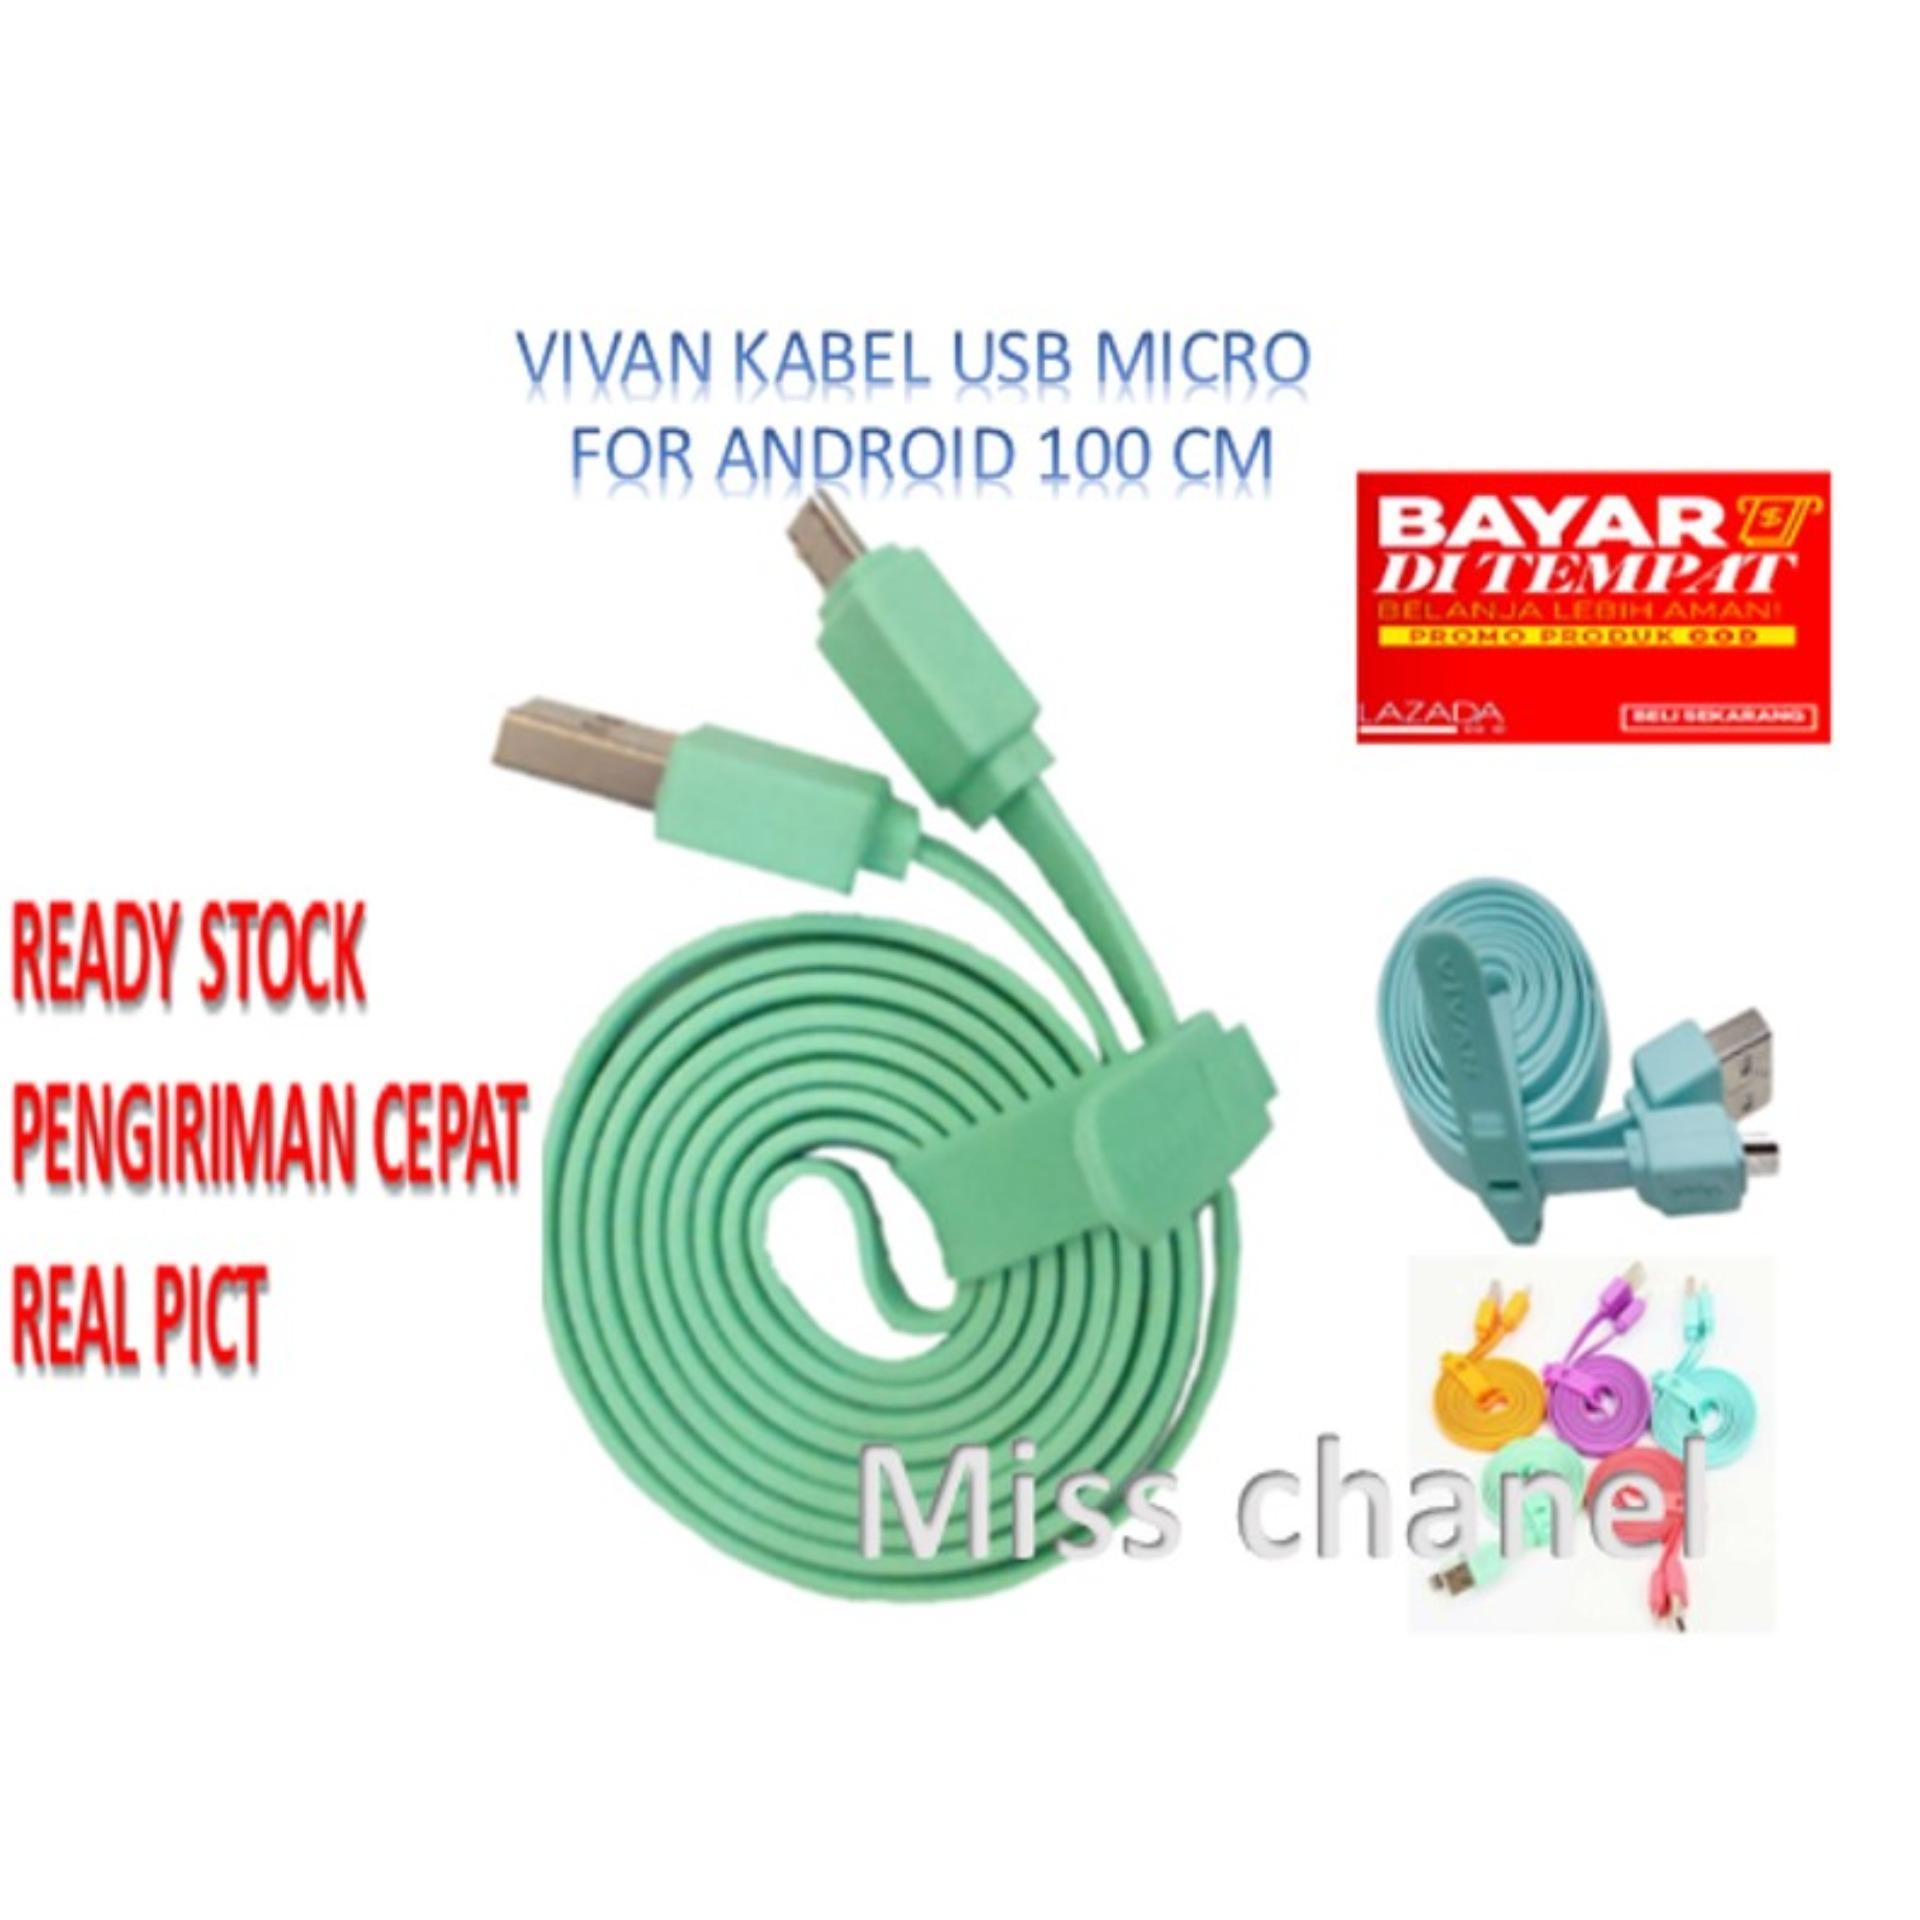 Emq Vivan Kabel Micro Usb Untuk Data Dan Charger 100cm By Miss Chanel.